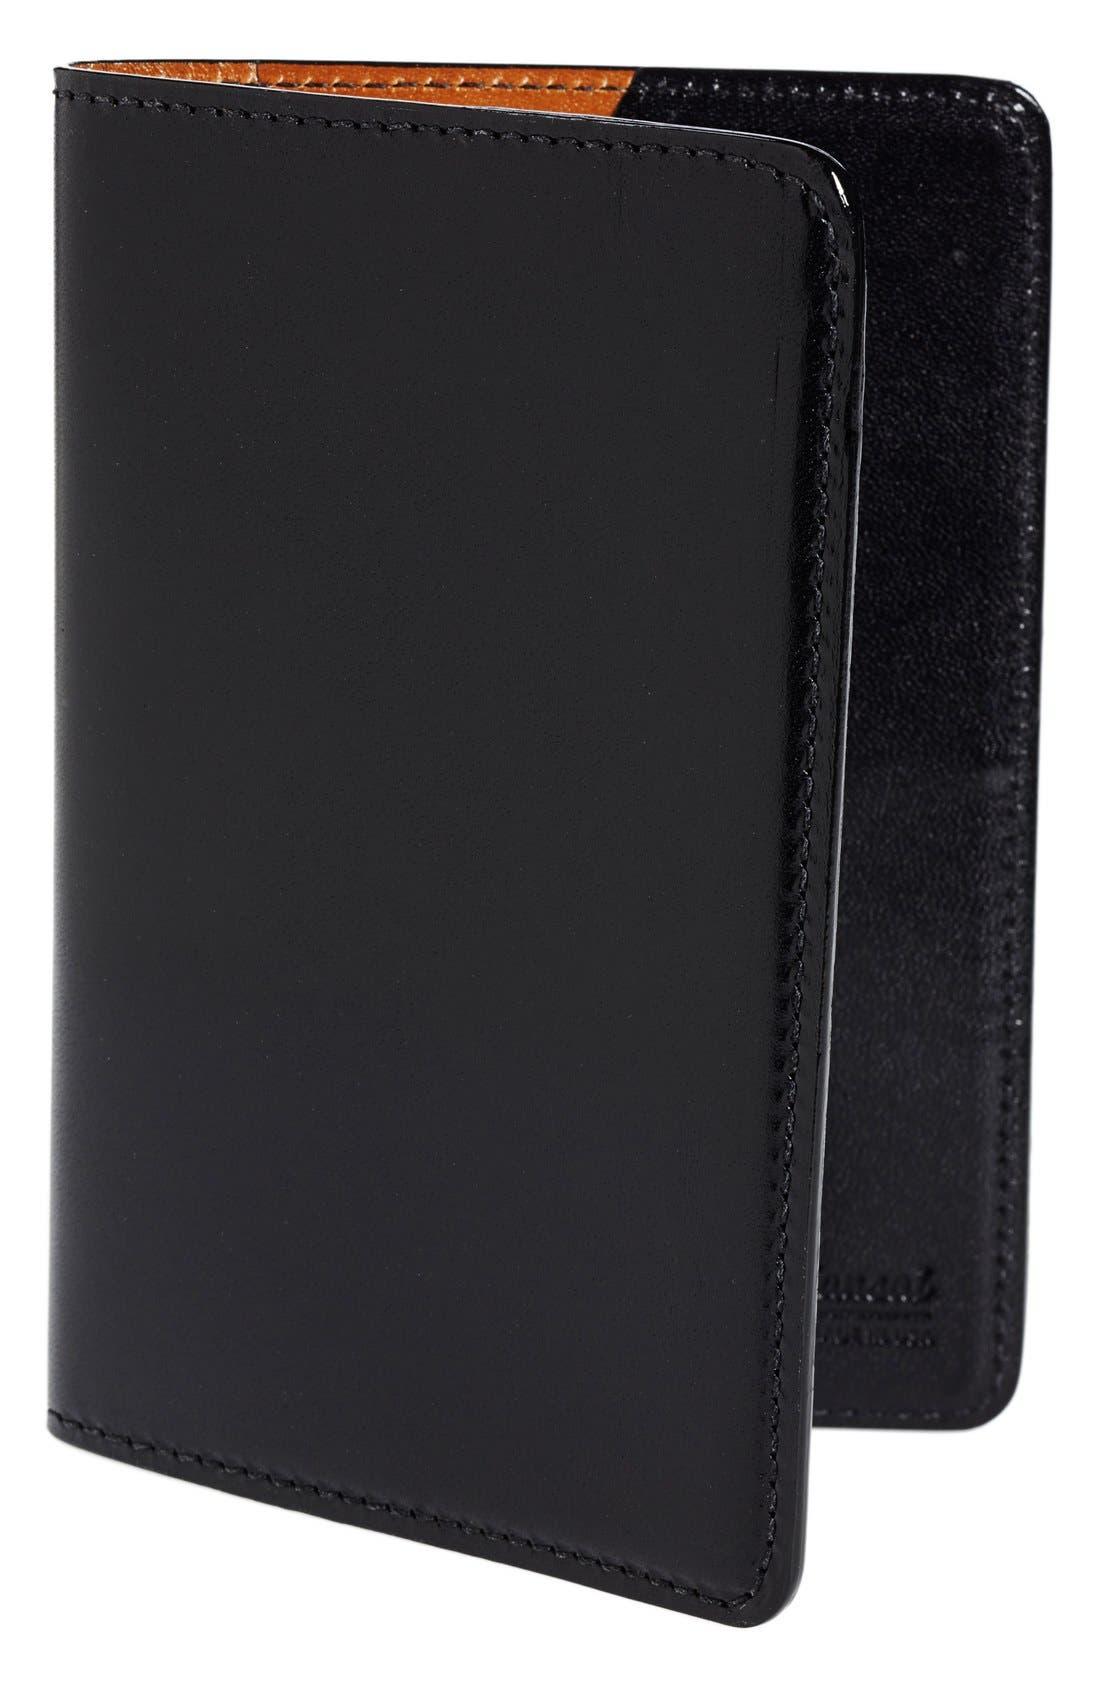 Leather Passport Wallet,                             Main thumbnail 1, color,                             005